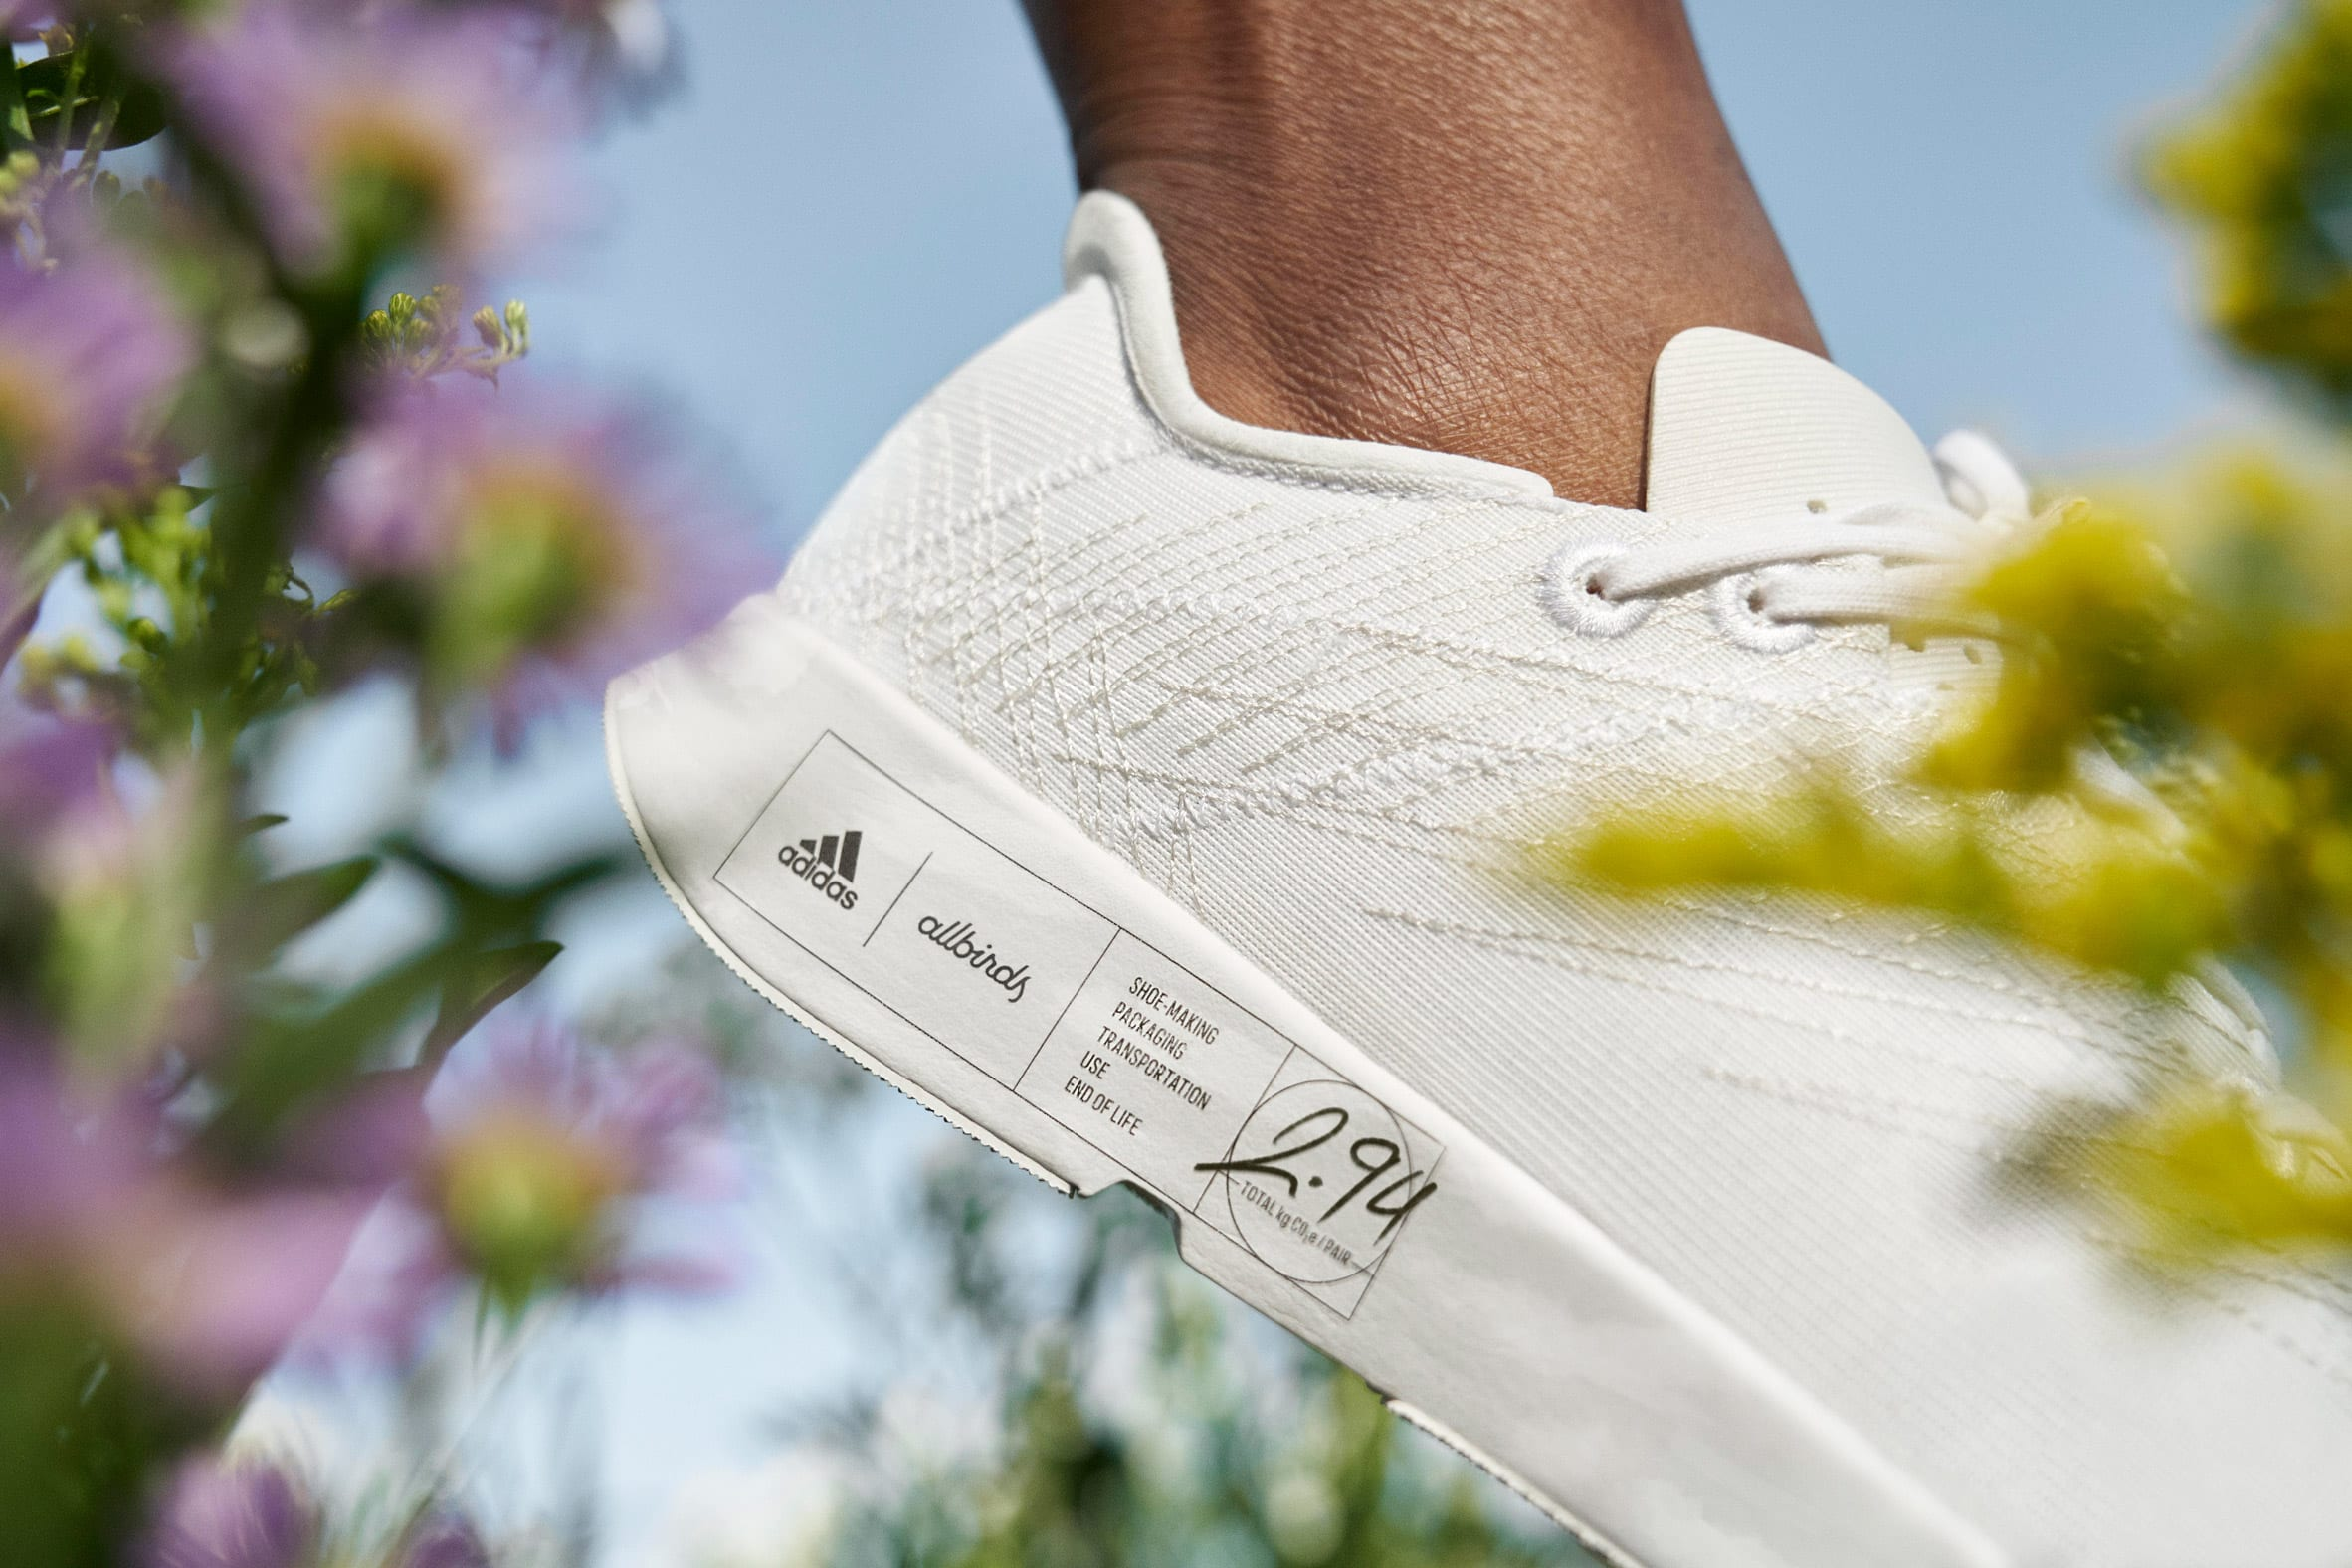 Close-up of carbon footprint label on Futurecraft.Footprint trainer